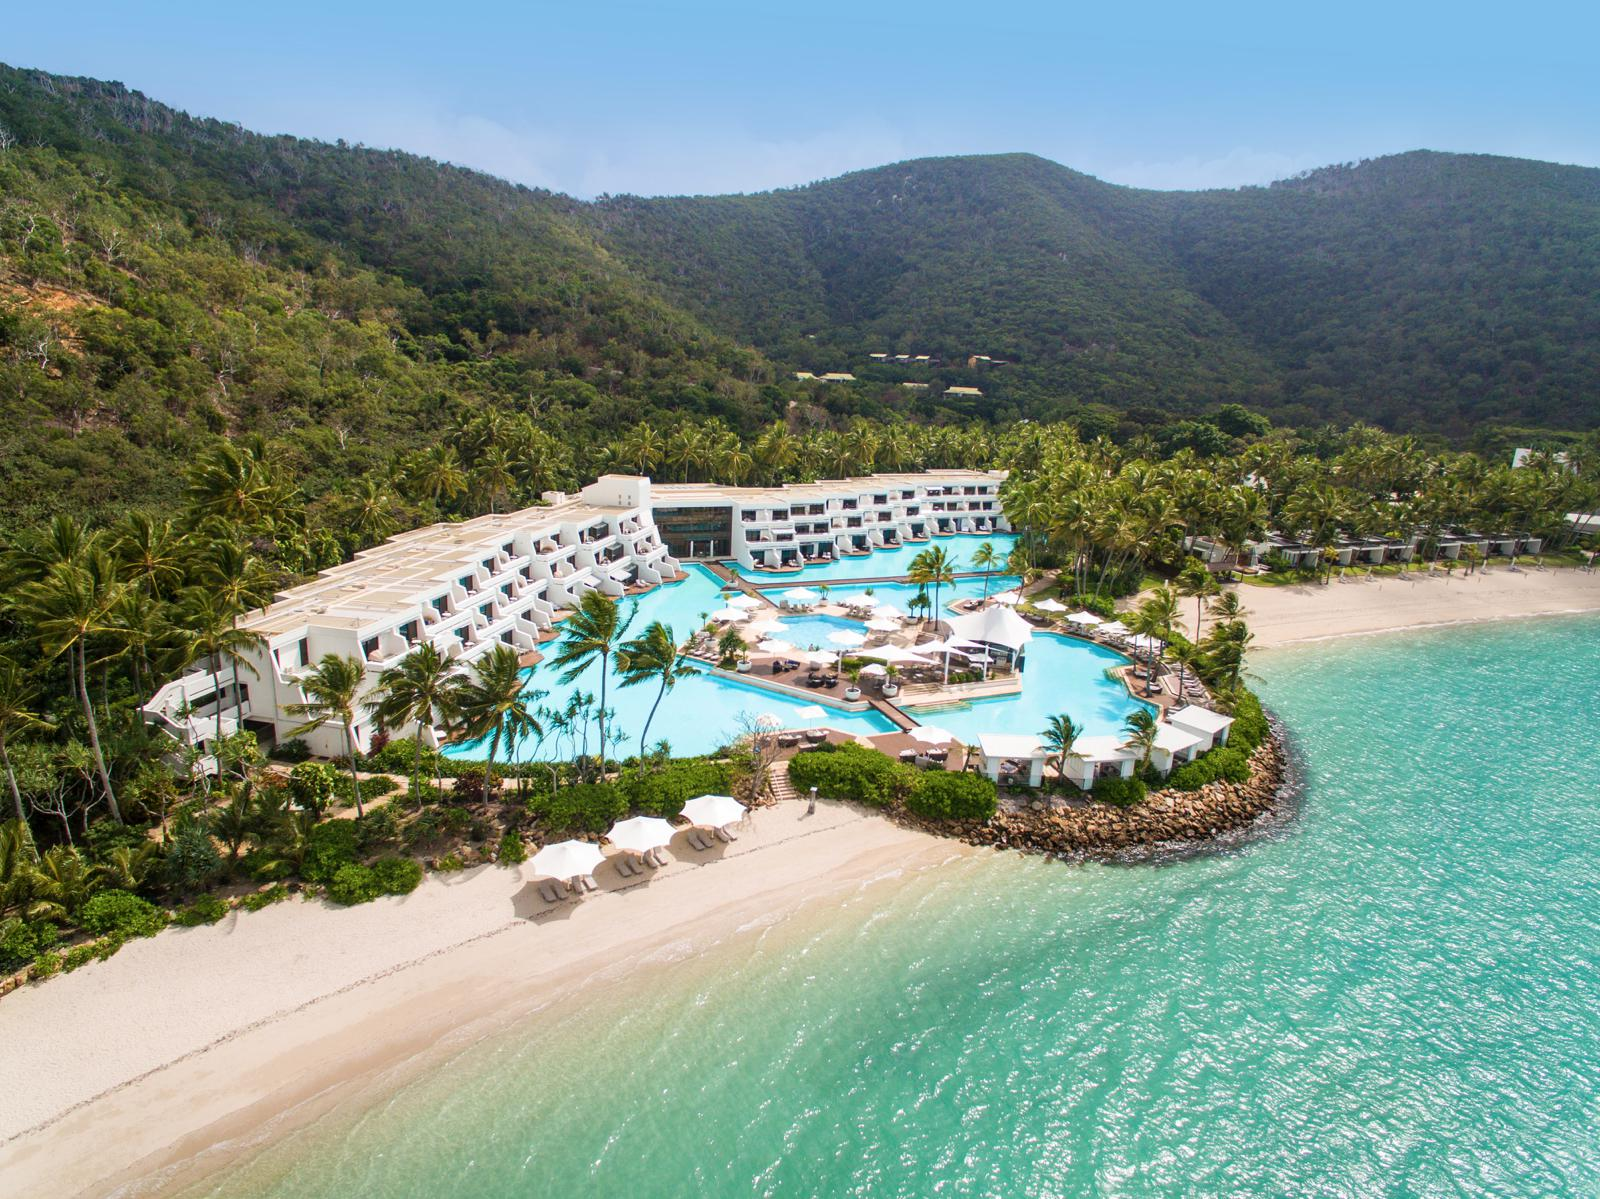 InterContinental-Hayman-Island-Resort-Aerial.jpg